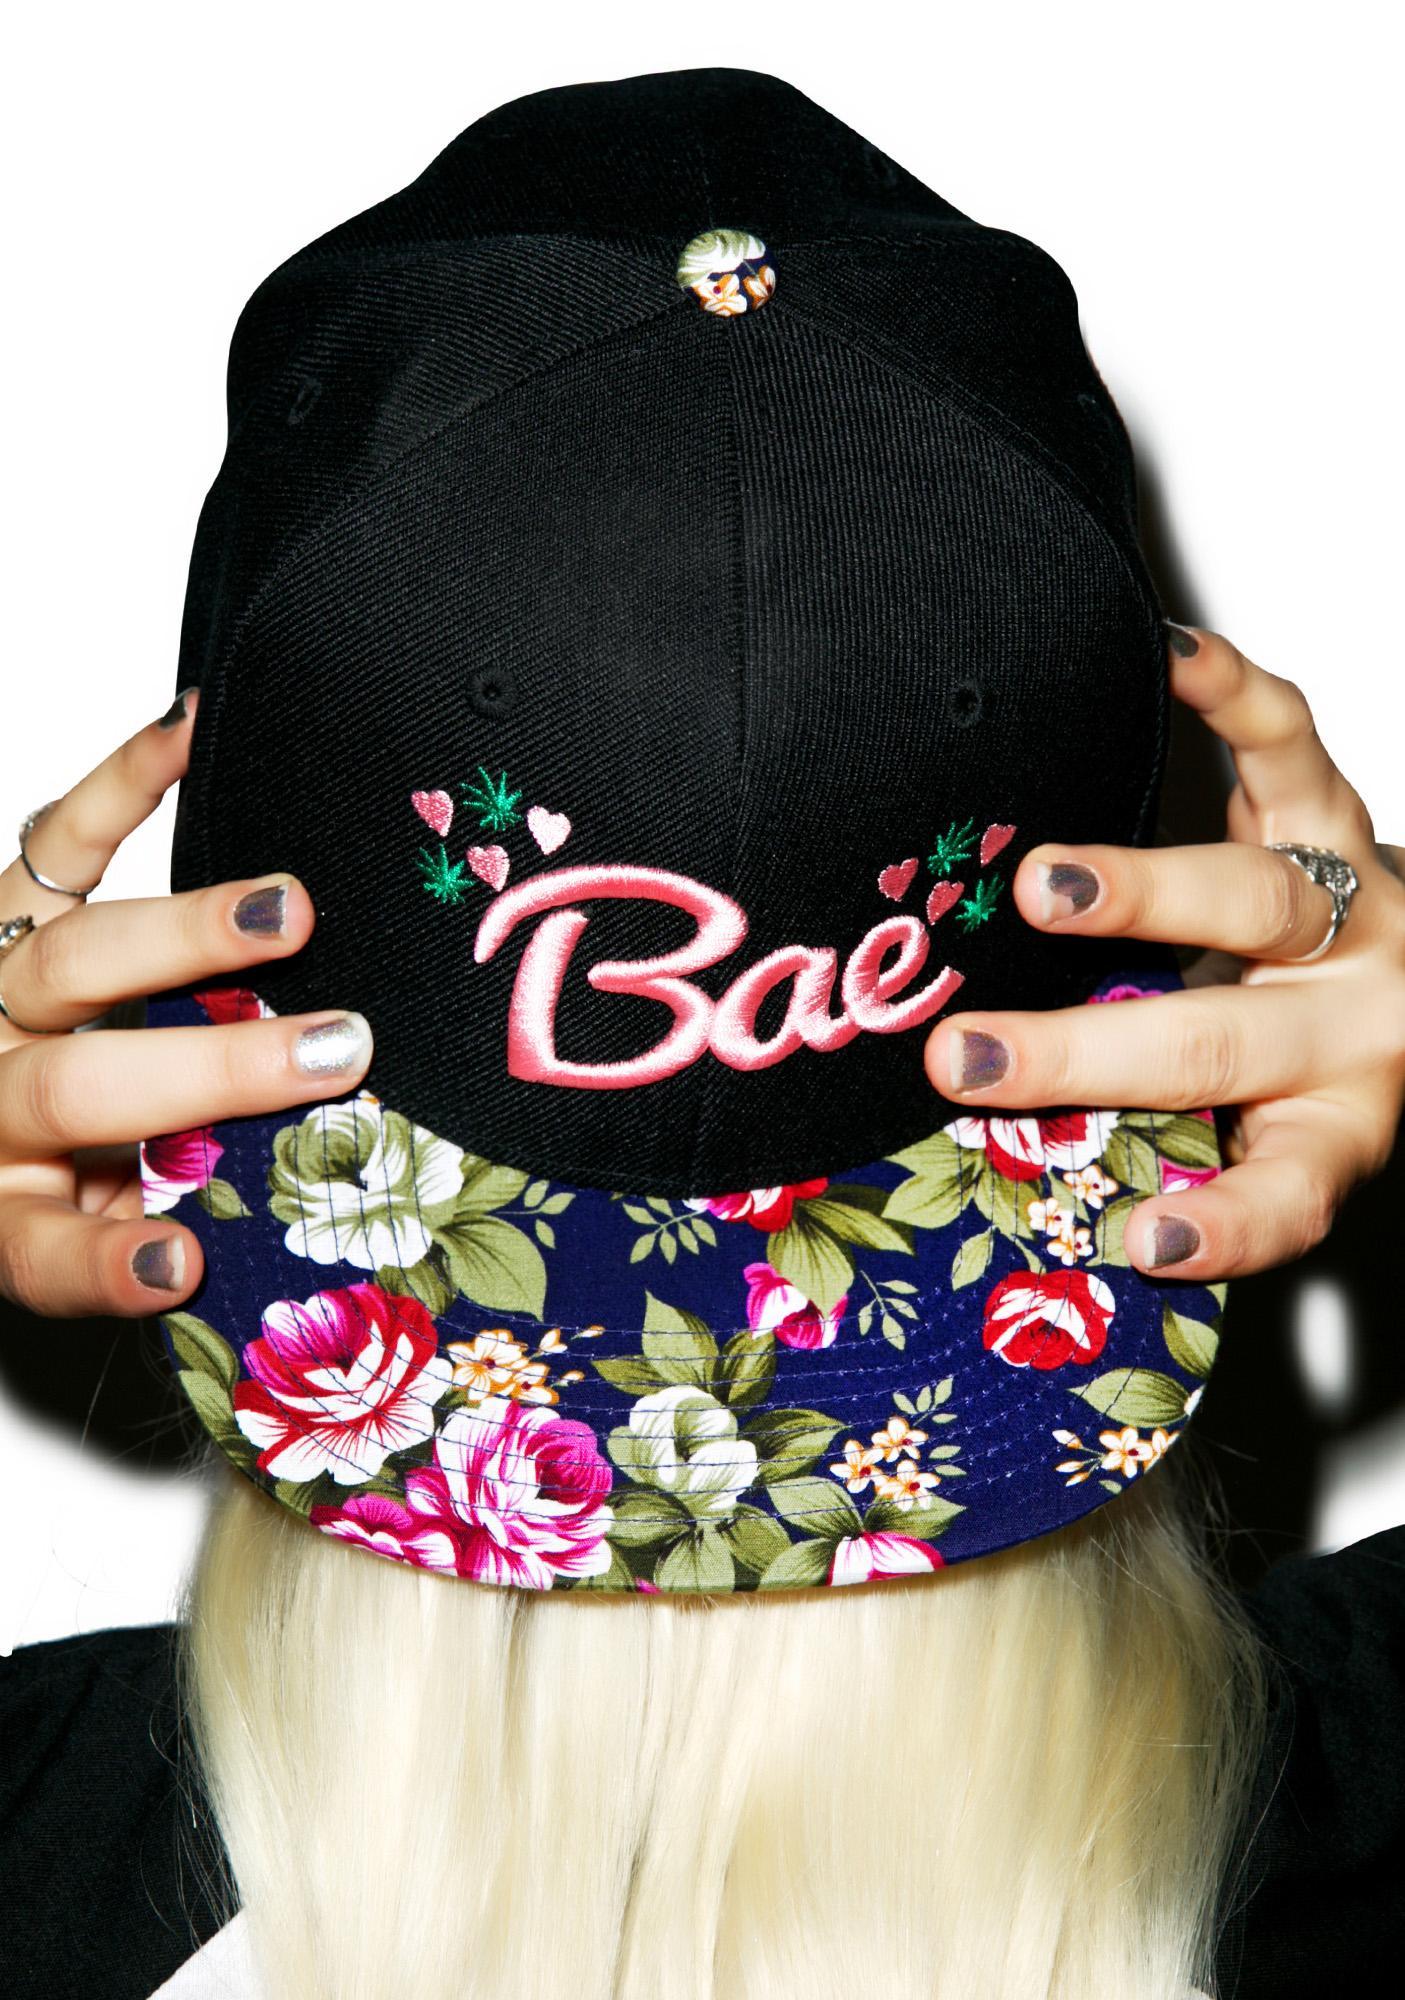 Hey Bae Snapback